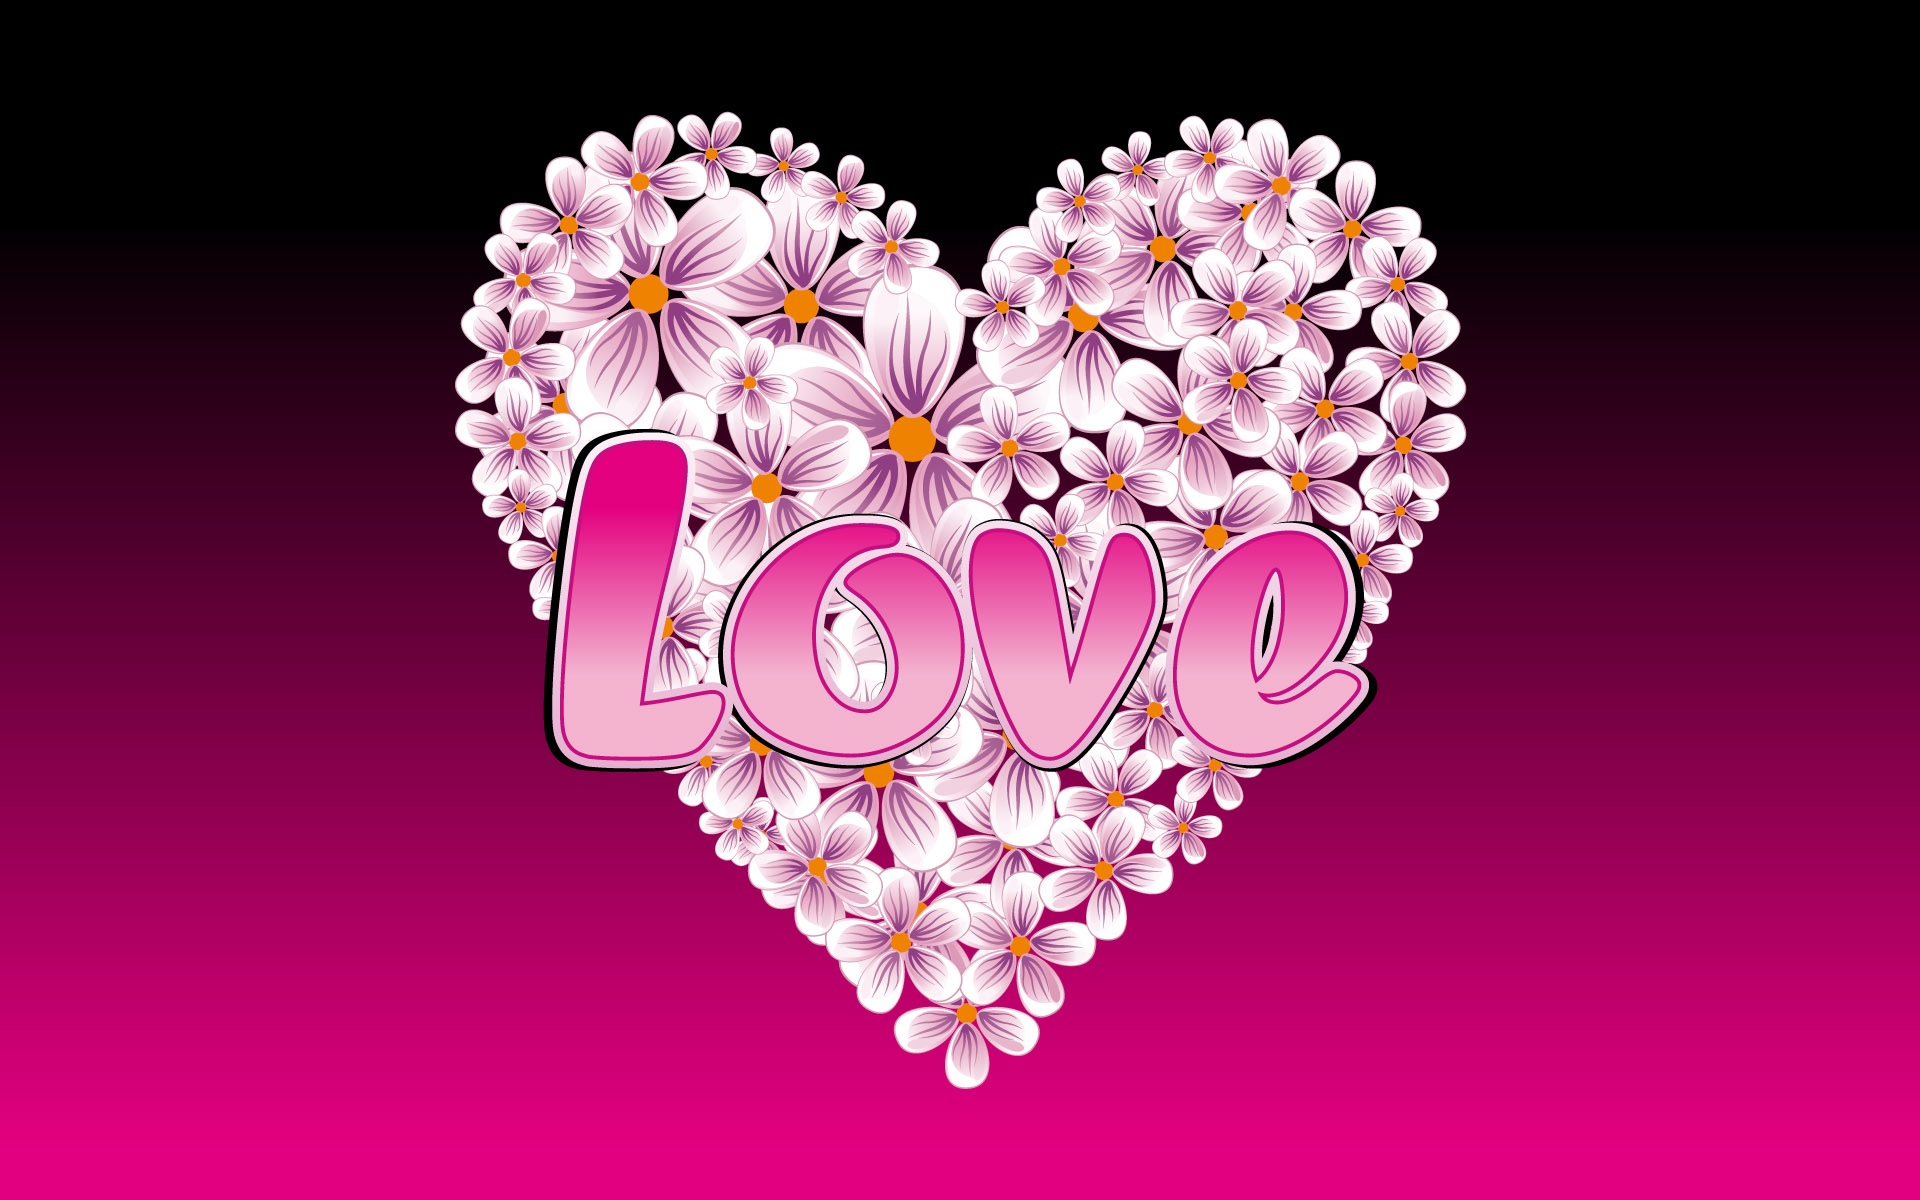 love heart shaped flowerflower - photo #7